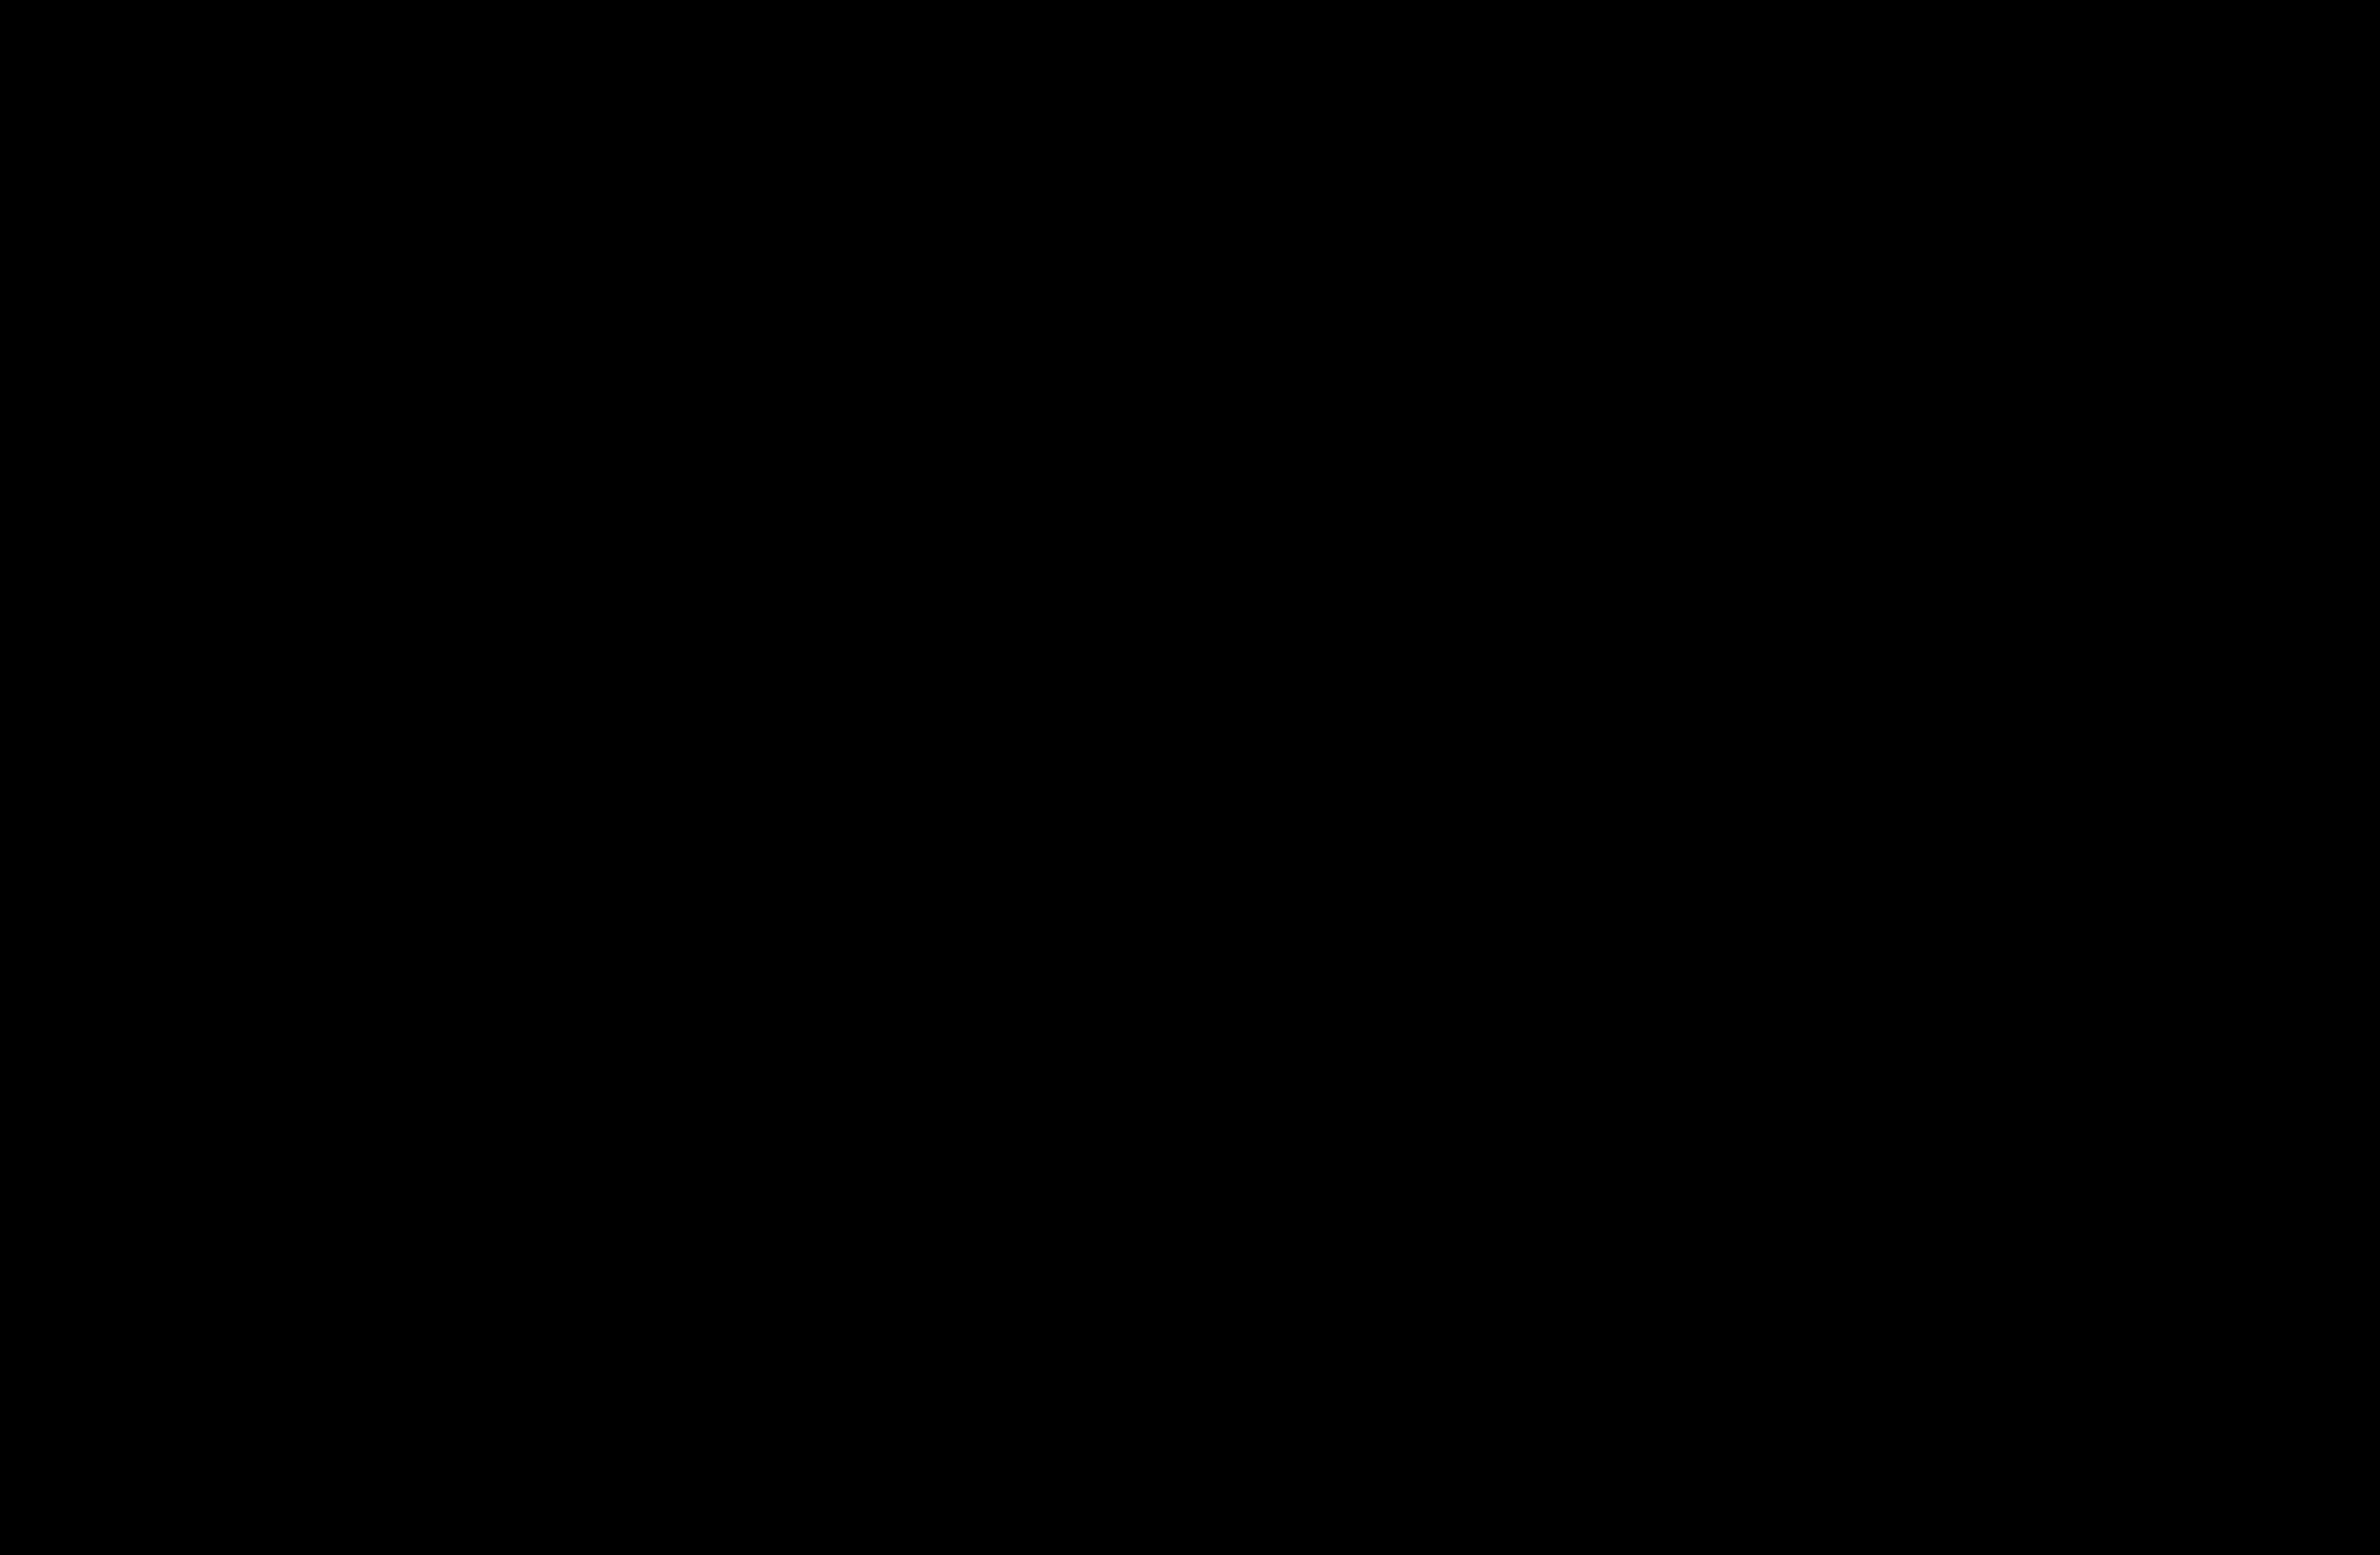 NU-Signature-01.png